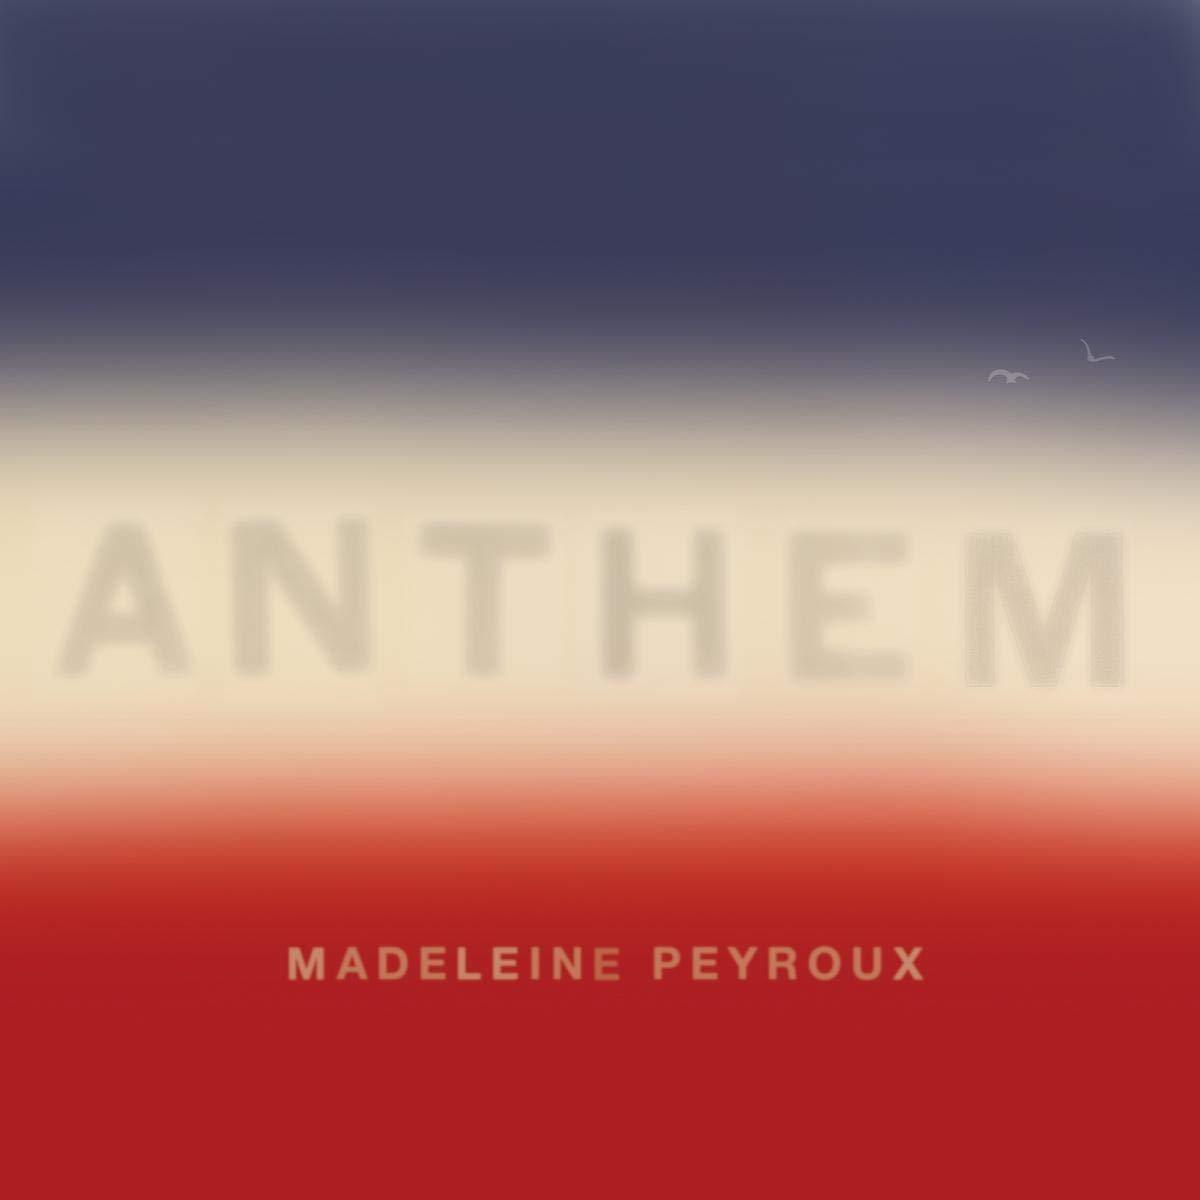 цена на Мадлен Пиру Madeleine Peyroux. Anthem